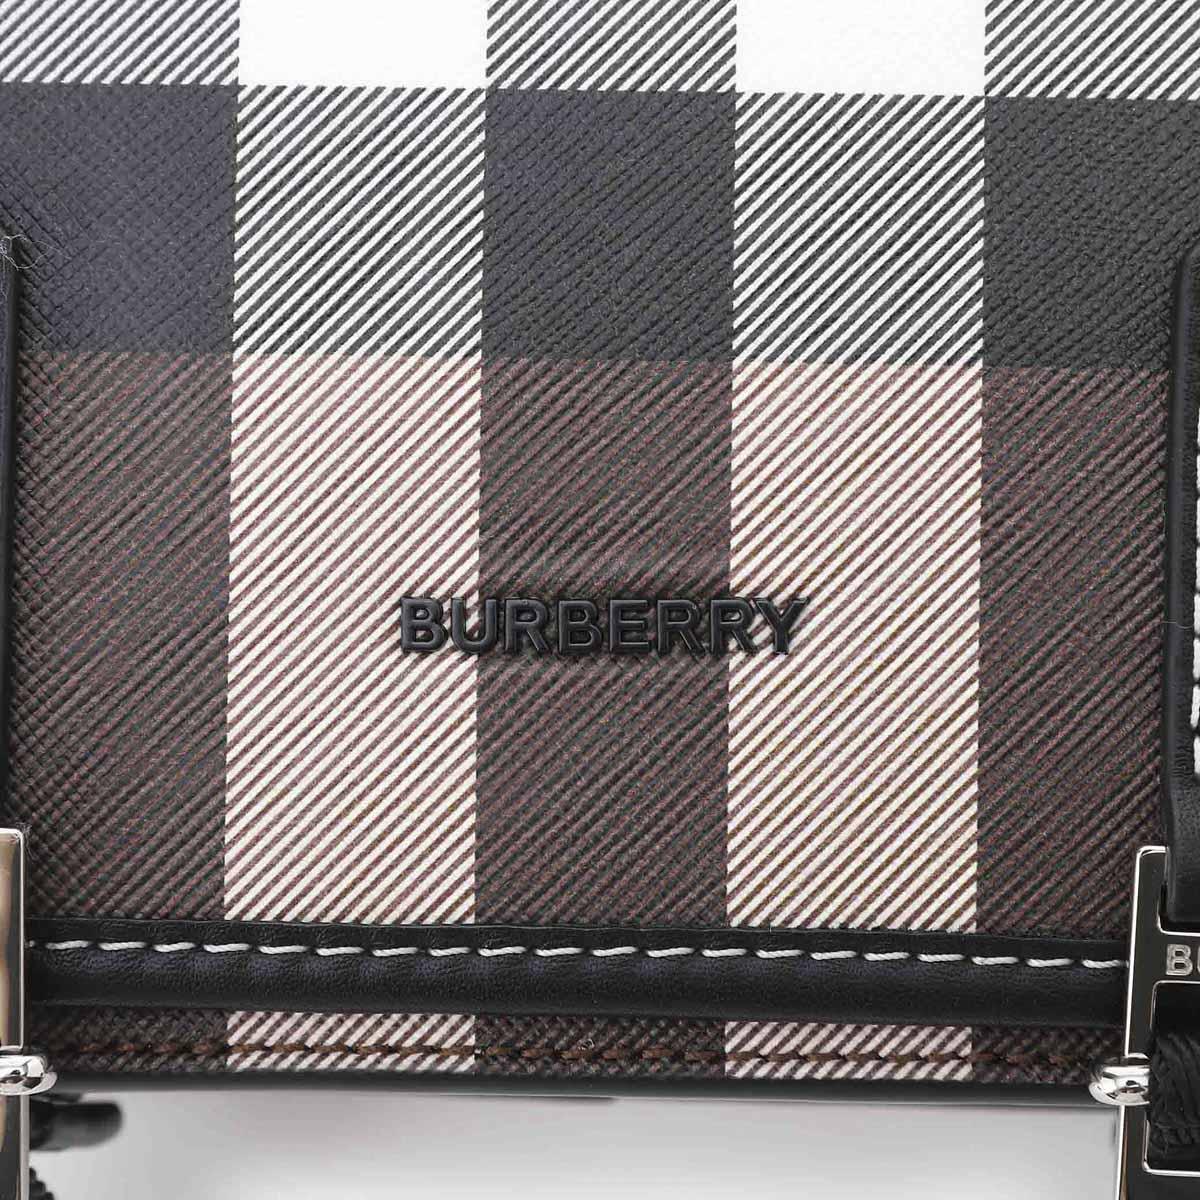 BURBERRY バーバリー ショルダーバッグ/クロスボディバッグ メンズ